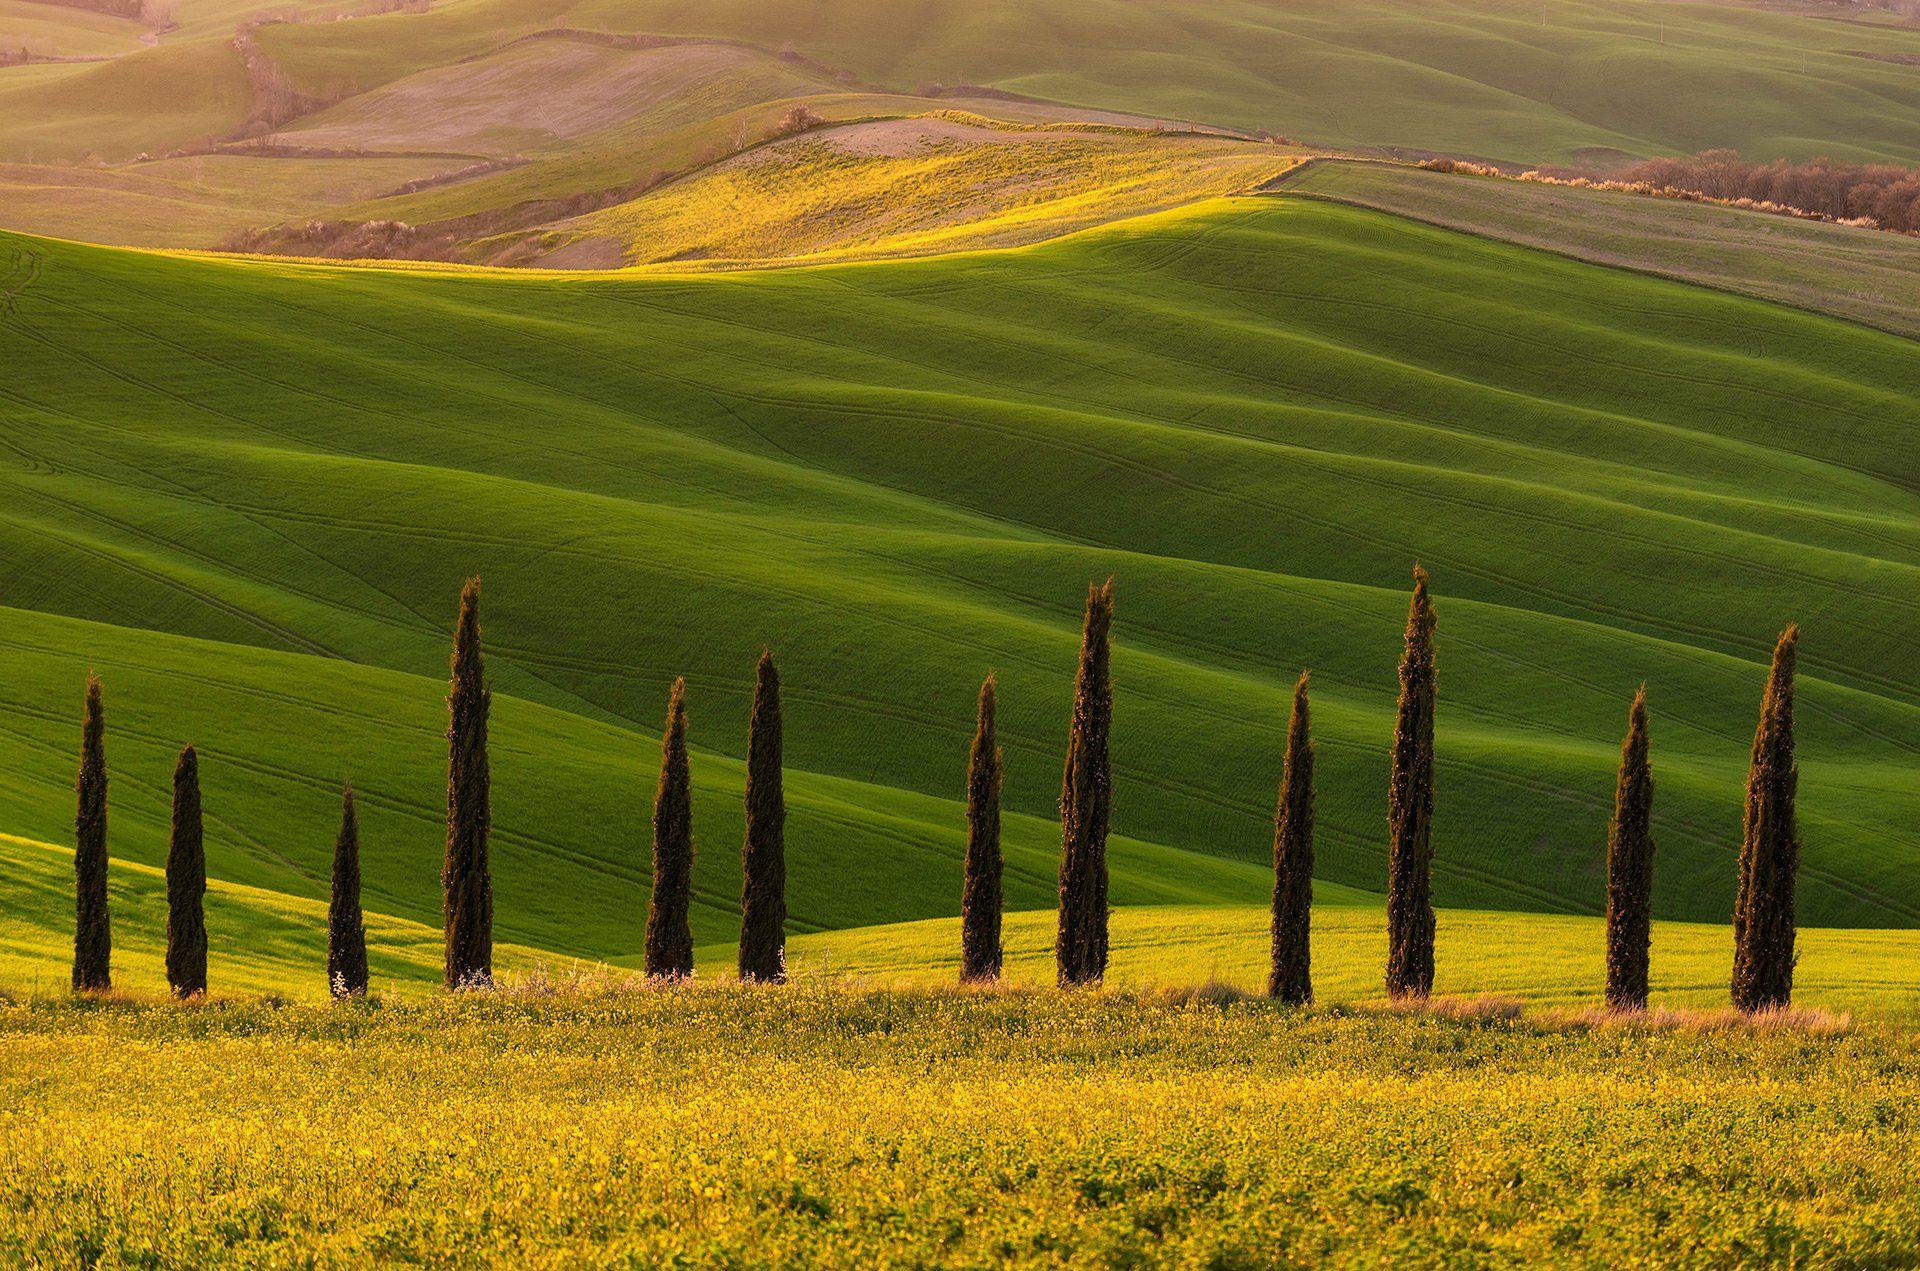 Tuscany, Crete Senesi, spring, valley, Тоскана, cipreses, Andrey Trifonov